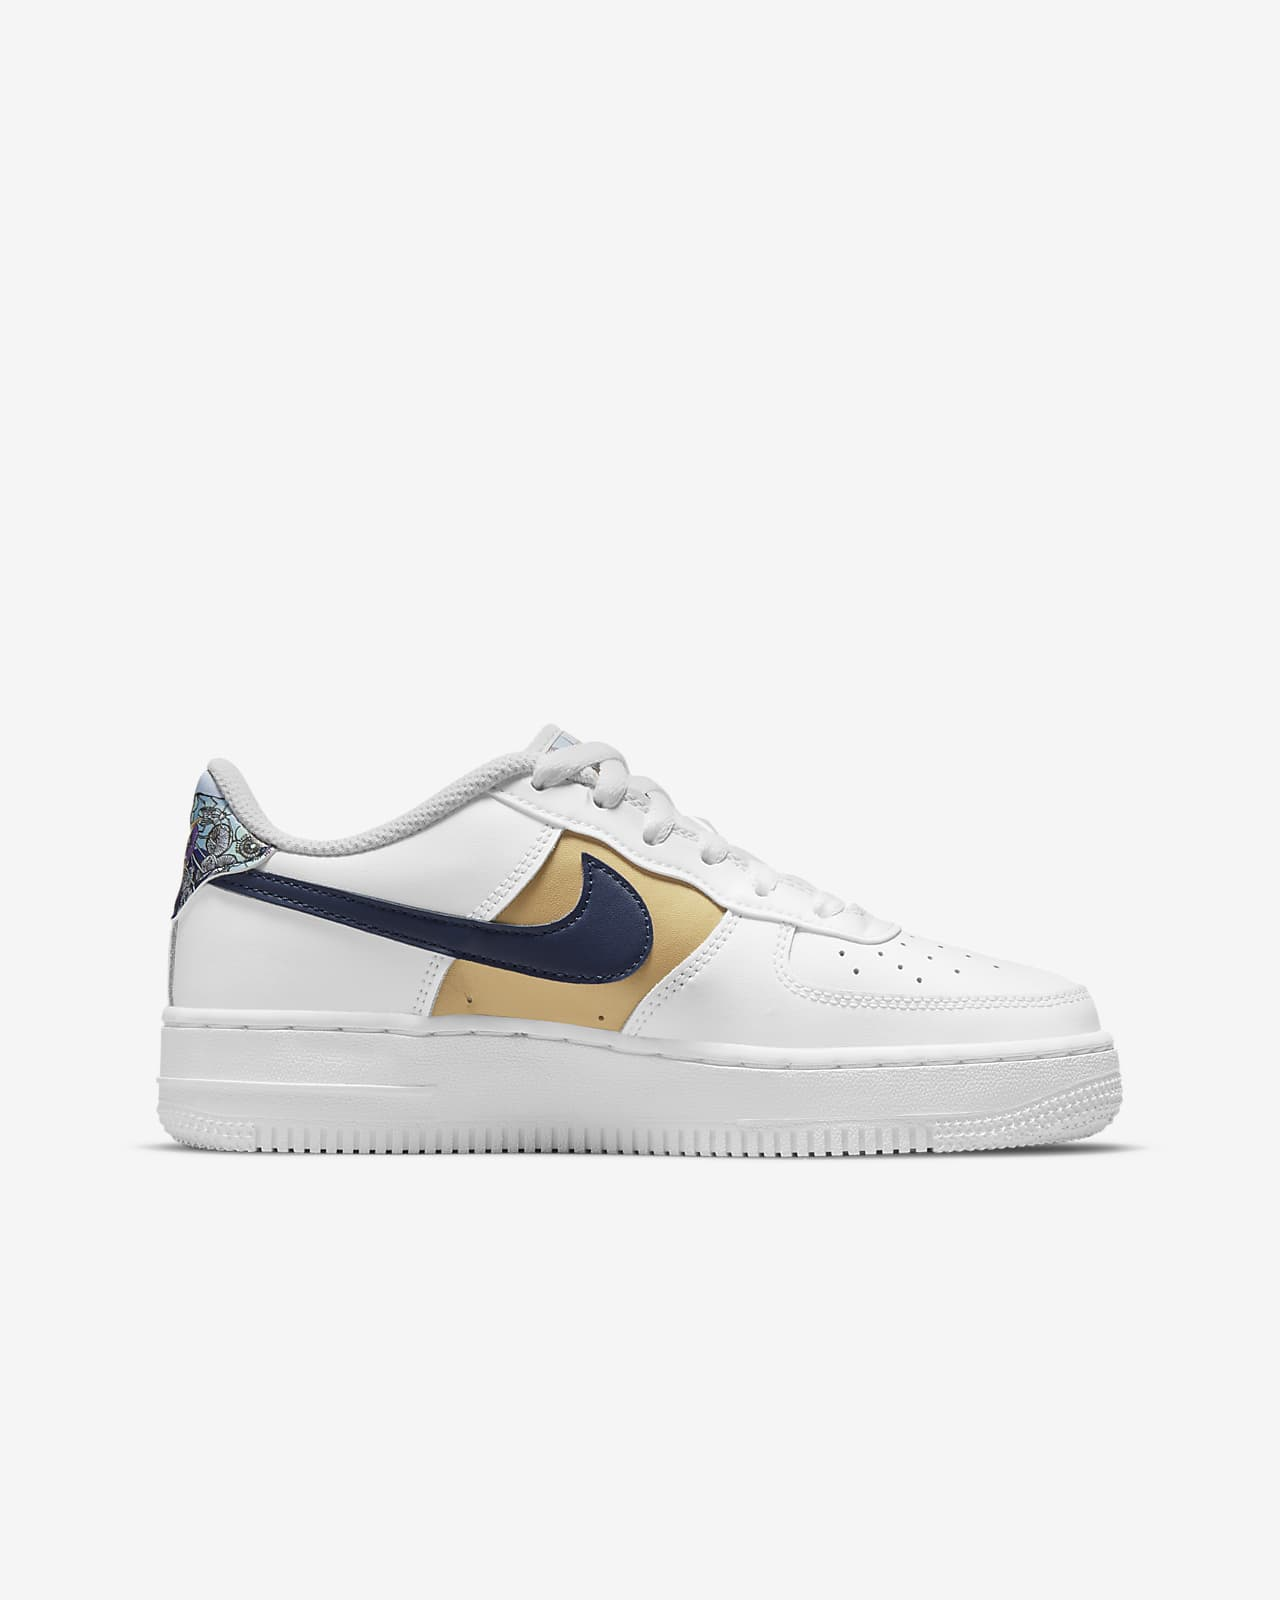 Nike Air Force 1 Low LV8 Older Kids' Shoes. Nike LU